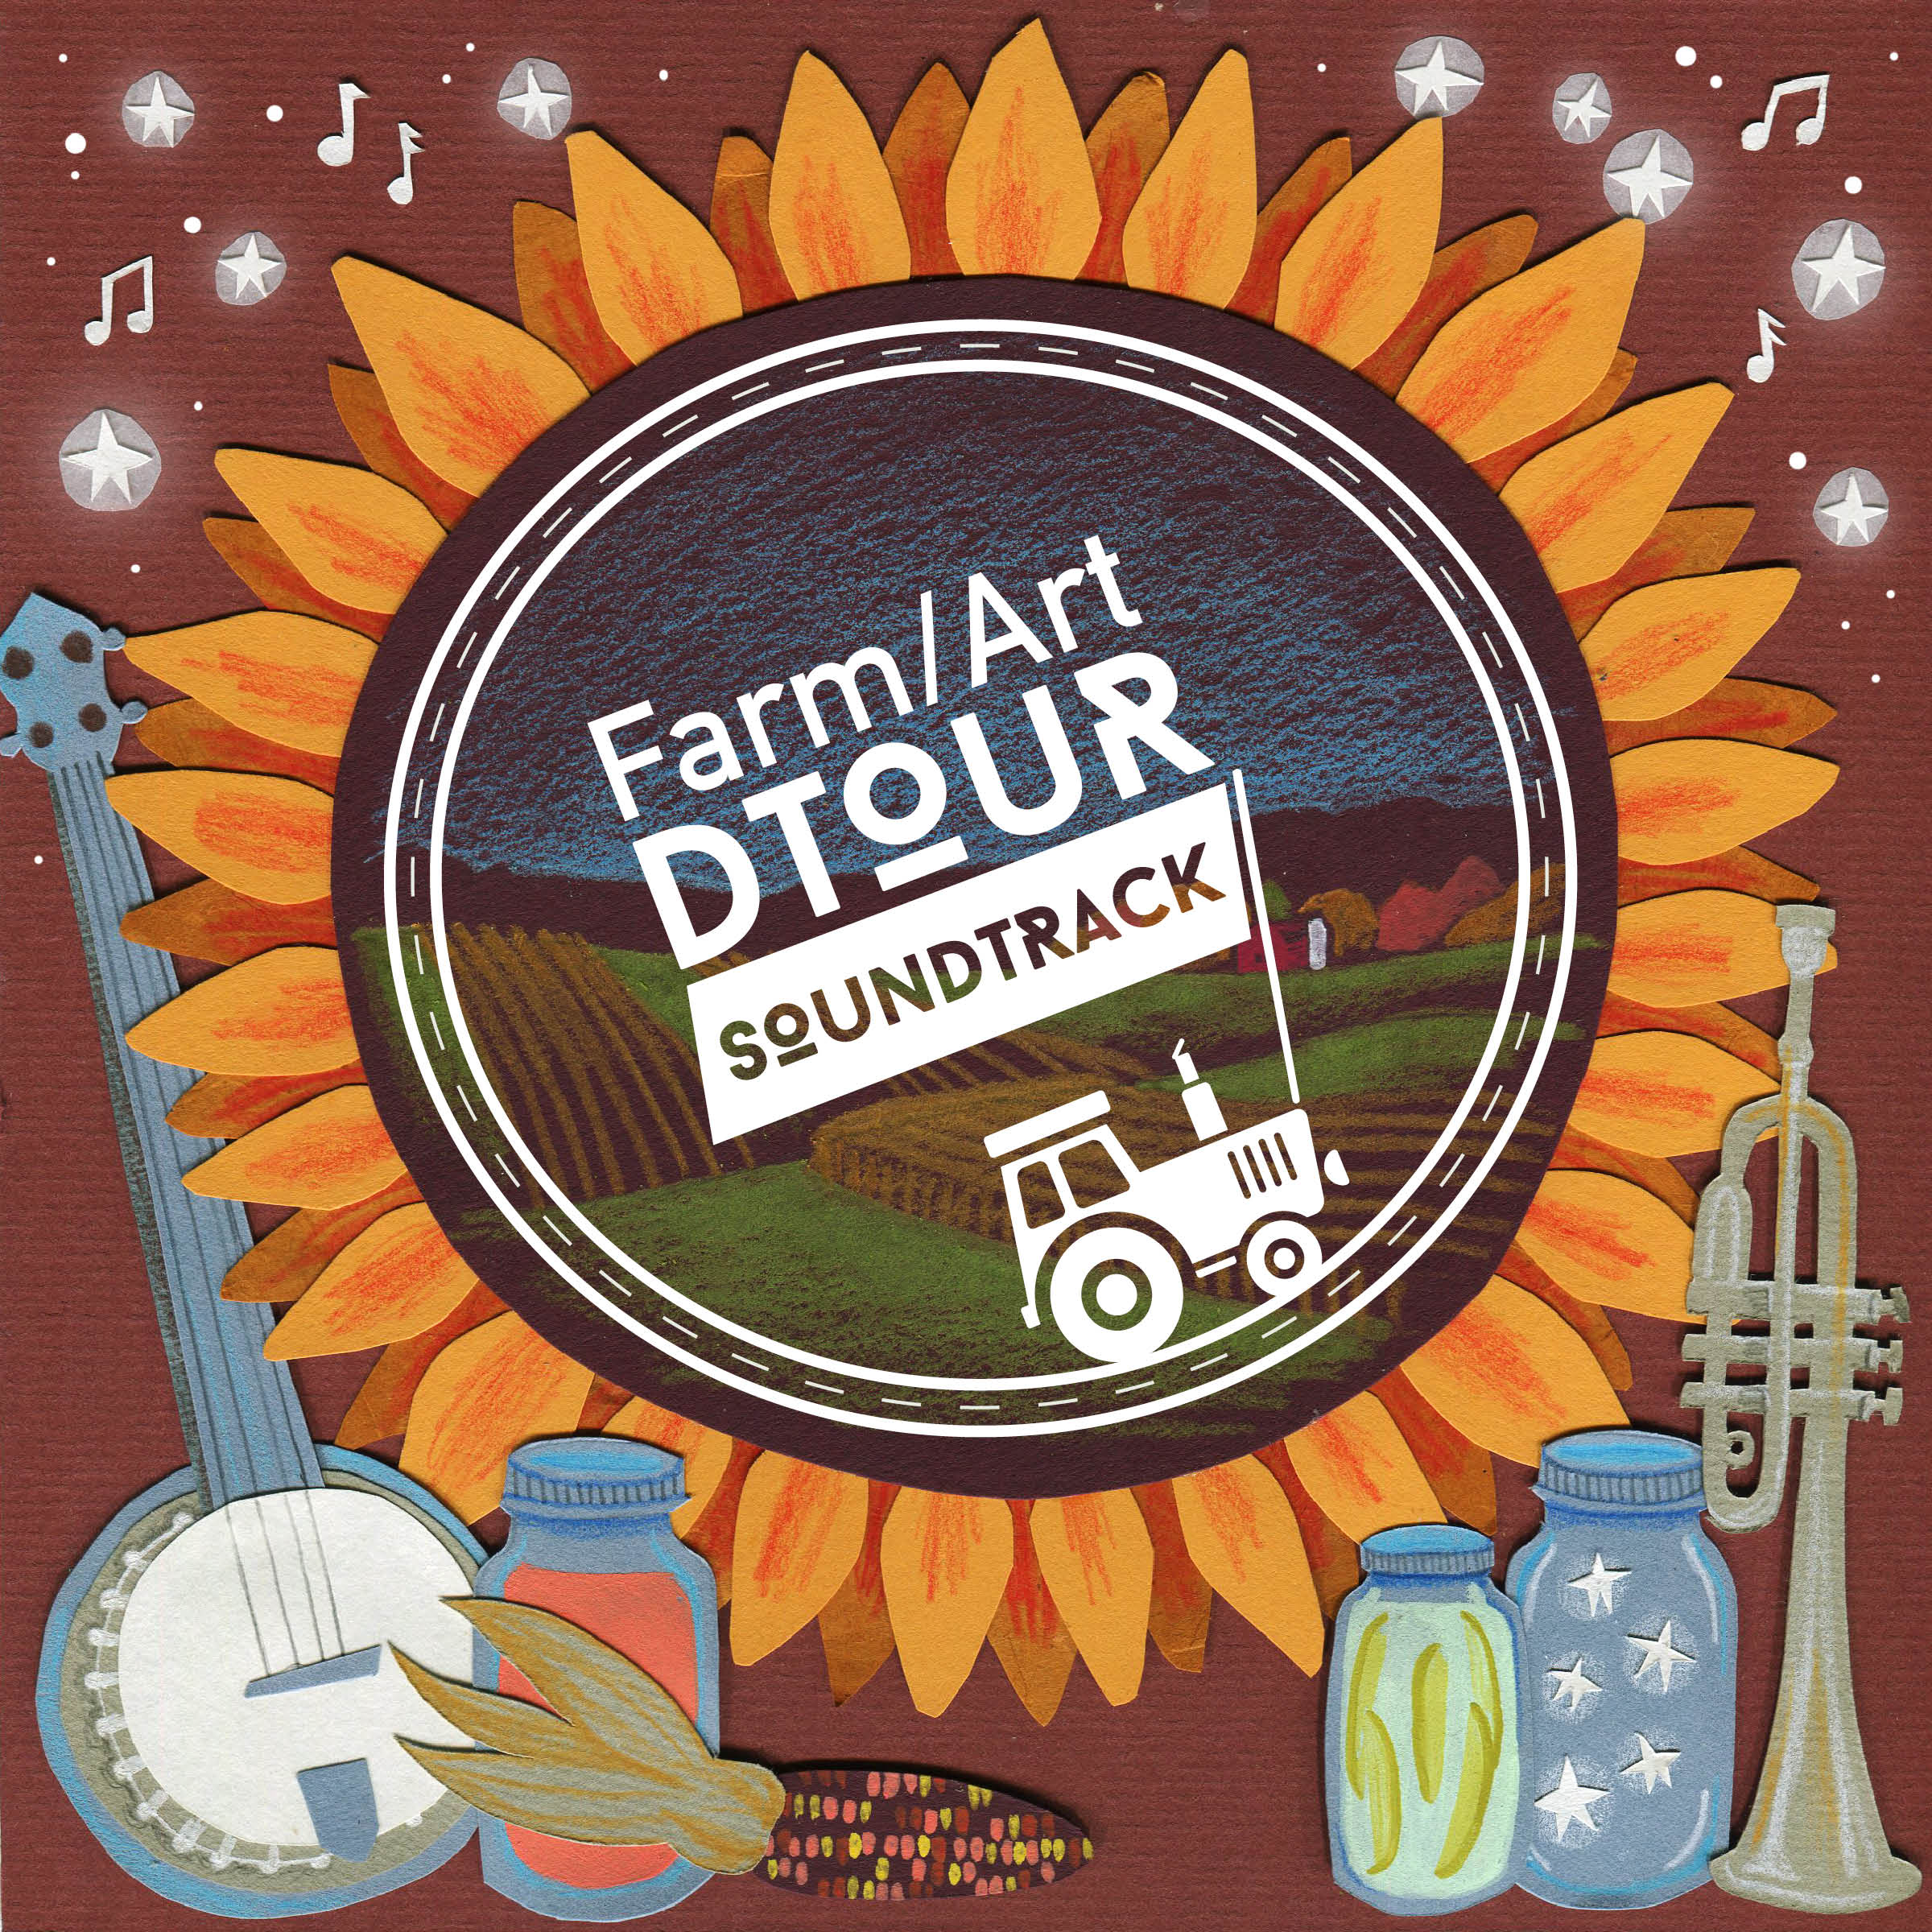 Wormfarm Institute | Farm/Art DTour Soundtrack   2016